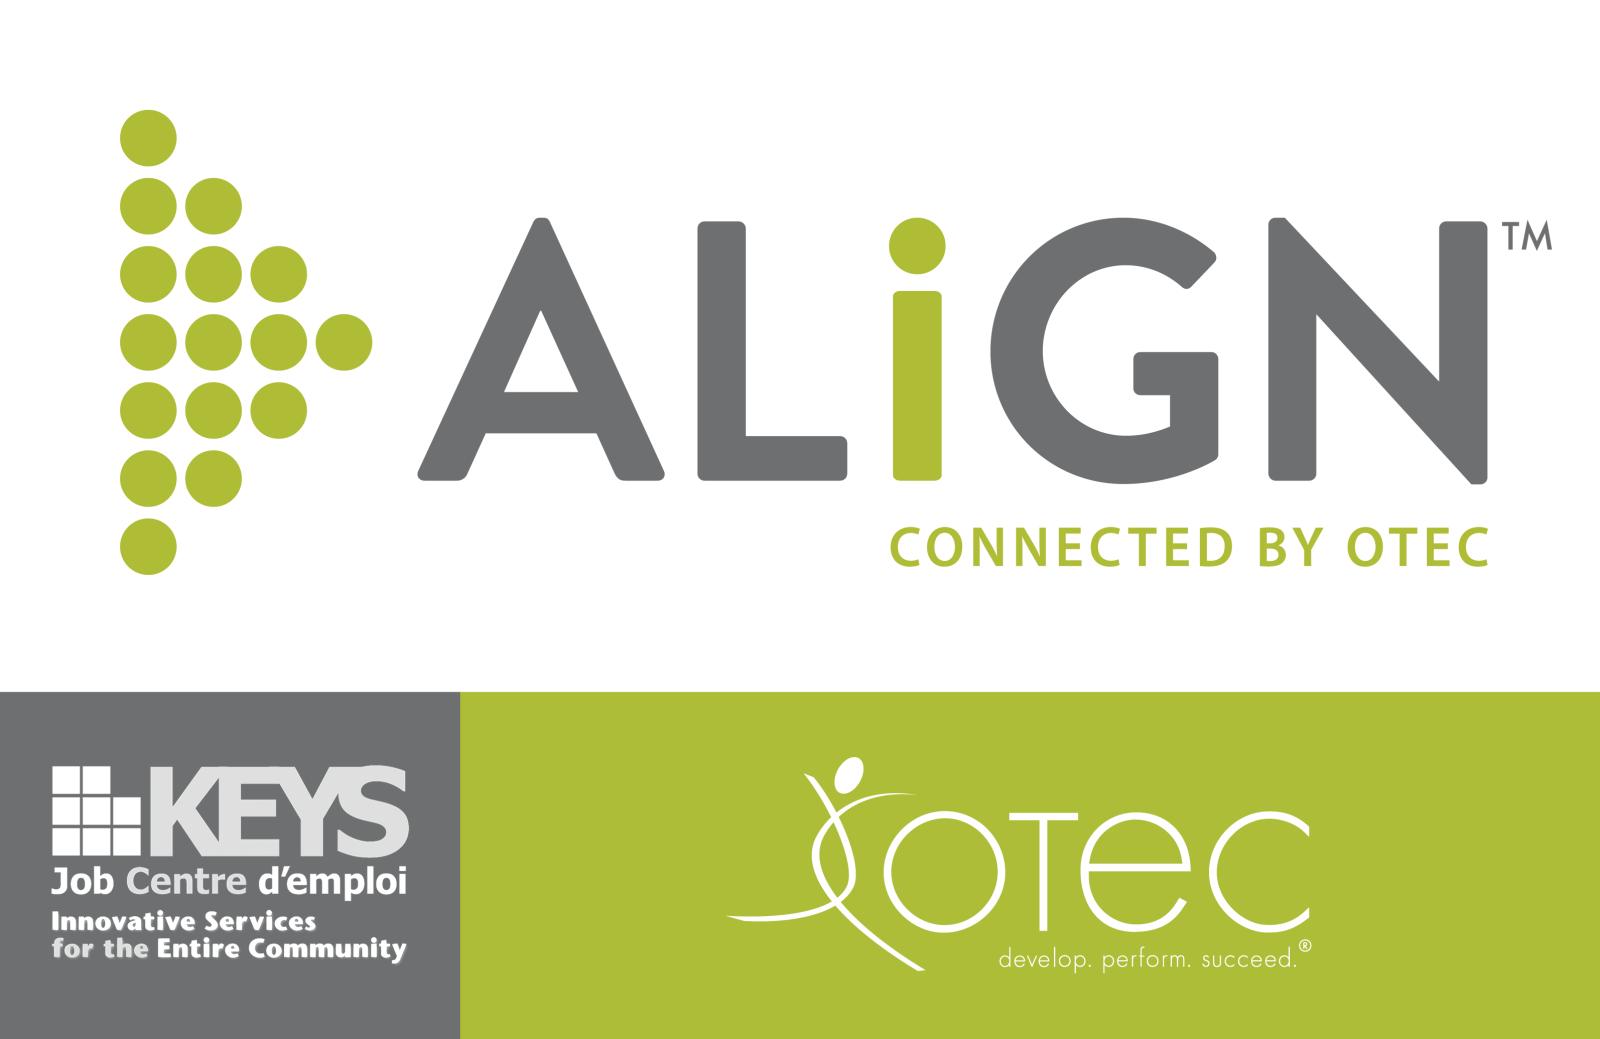 ALiGN Network - OTEC and KEYS Job Centre